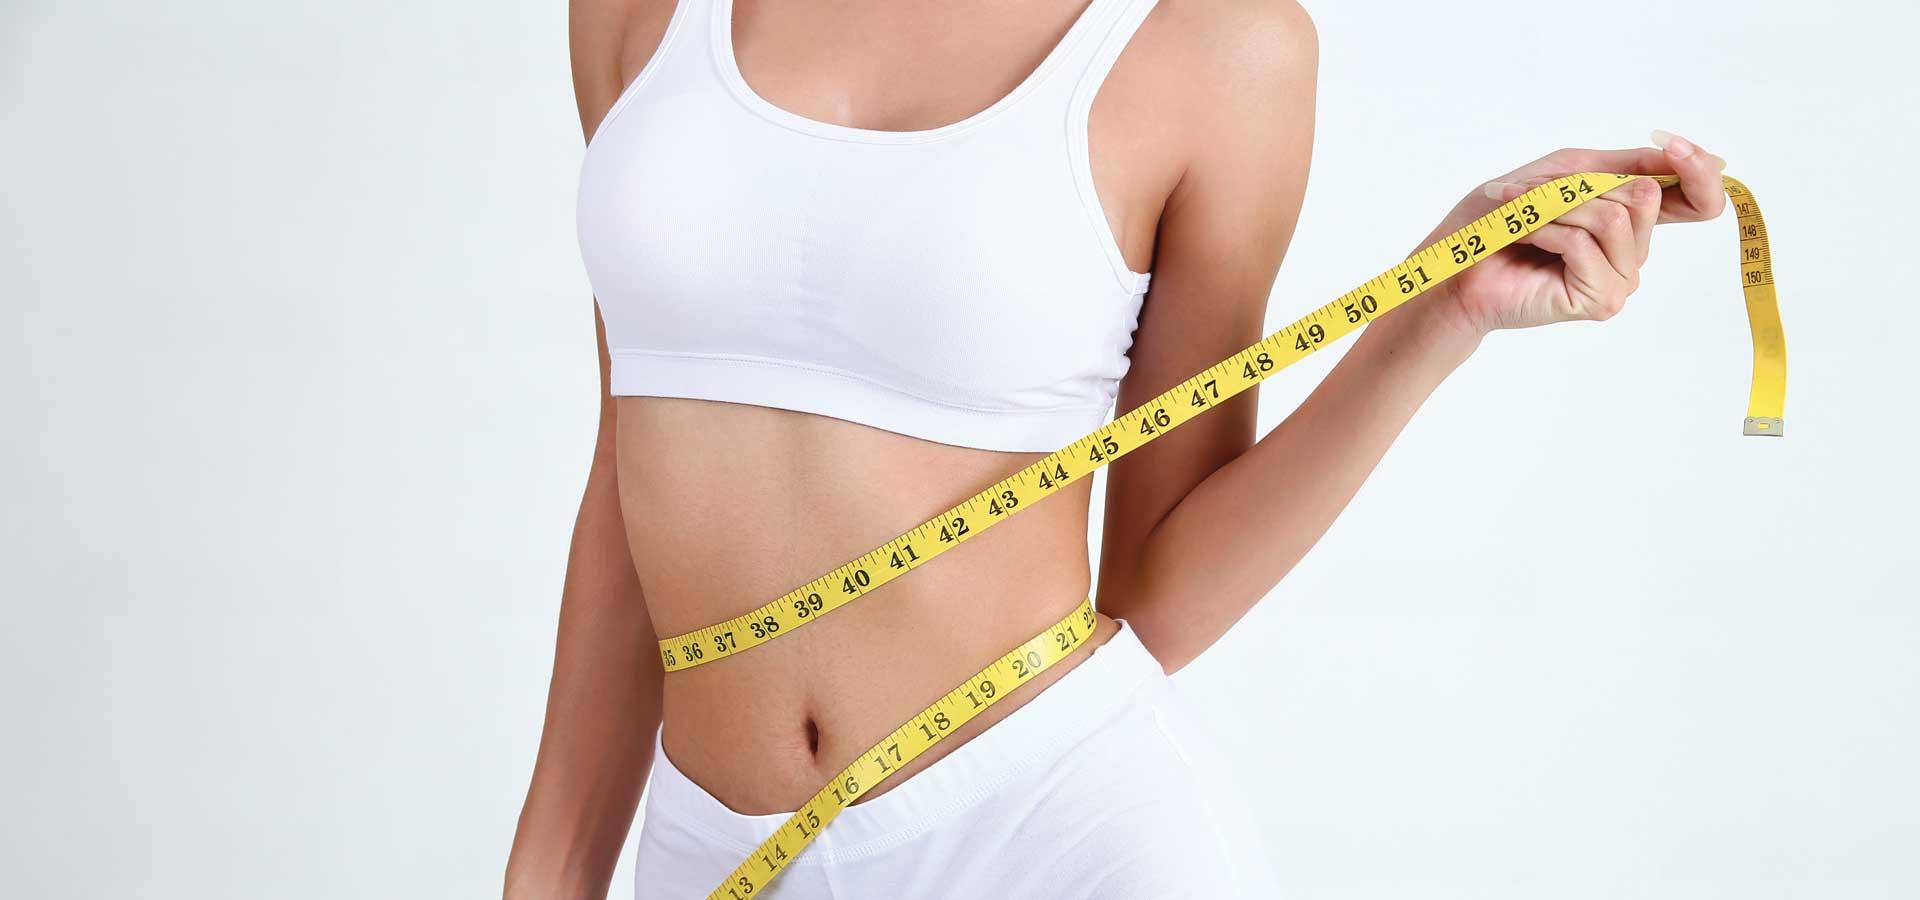 emsam provoque-t-il une perte de poids